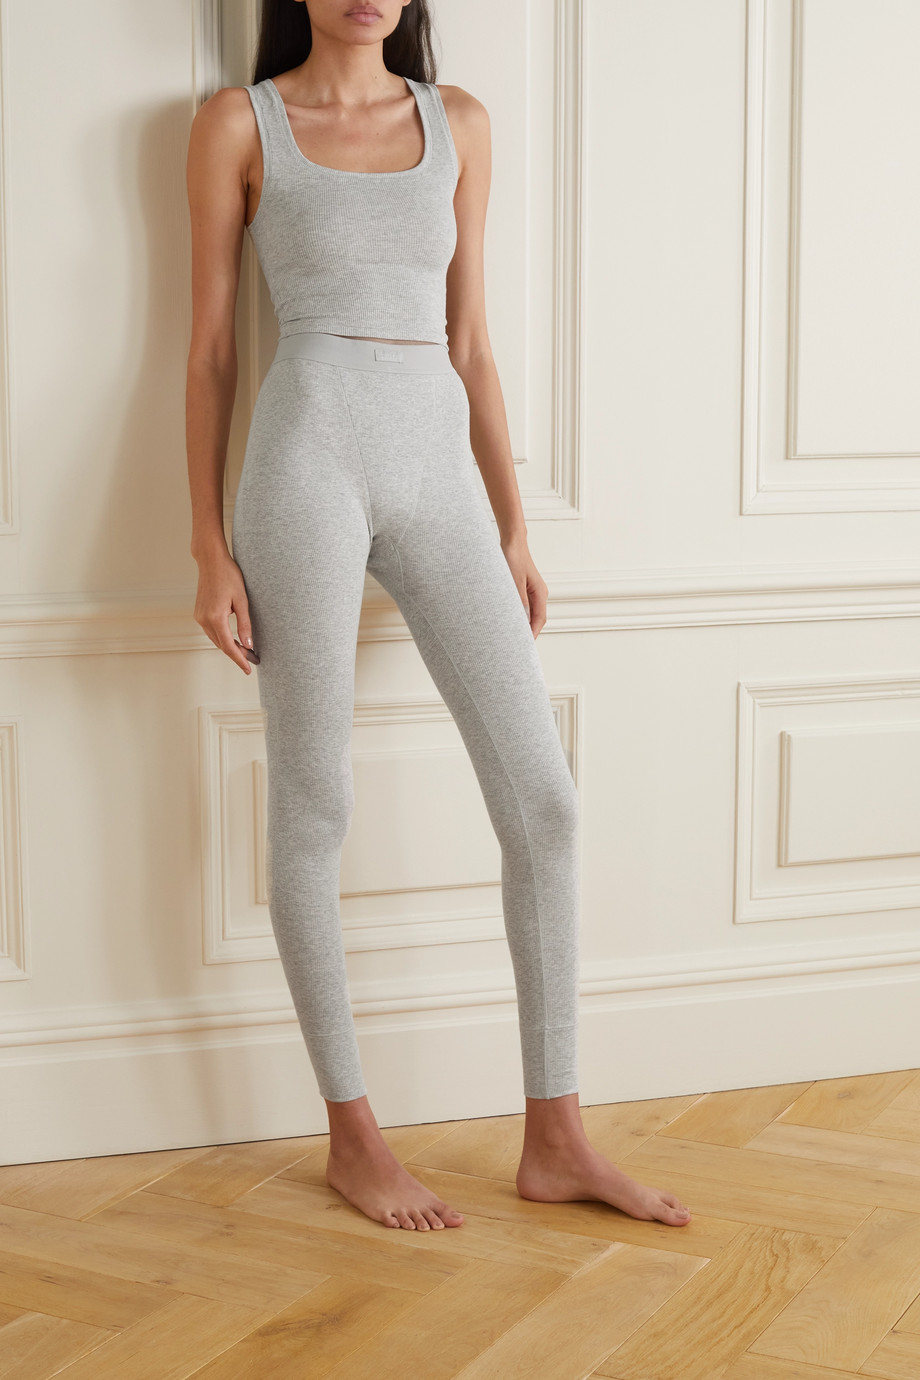 SKIMS Cotton Rib Thermal Legging –  Light Heather Grey – Leggings aus gerippter Stretch-Baumwolle